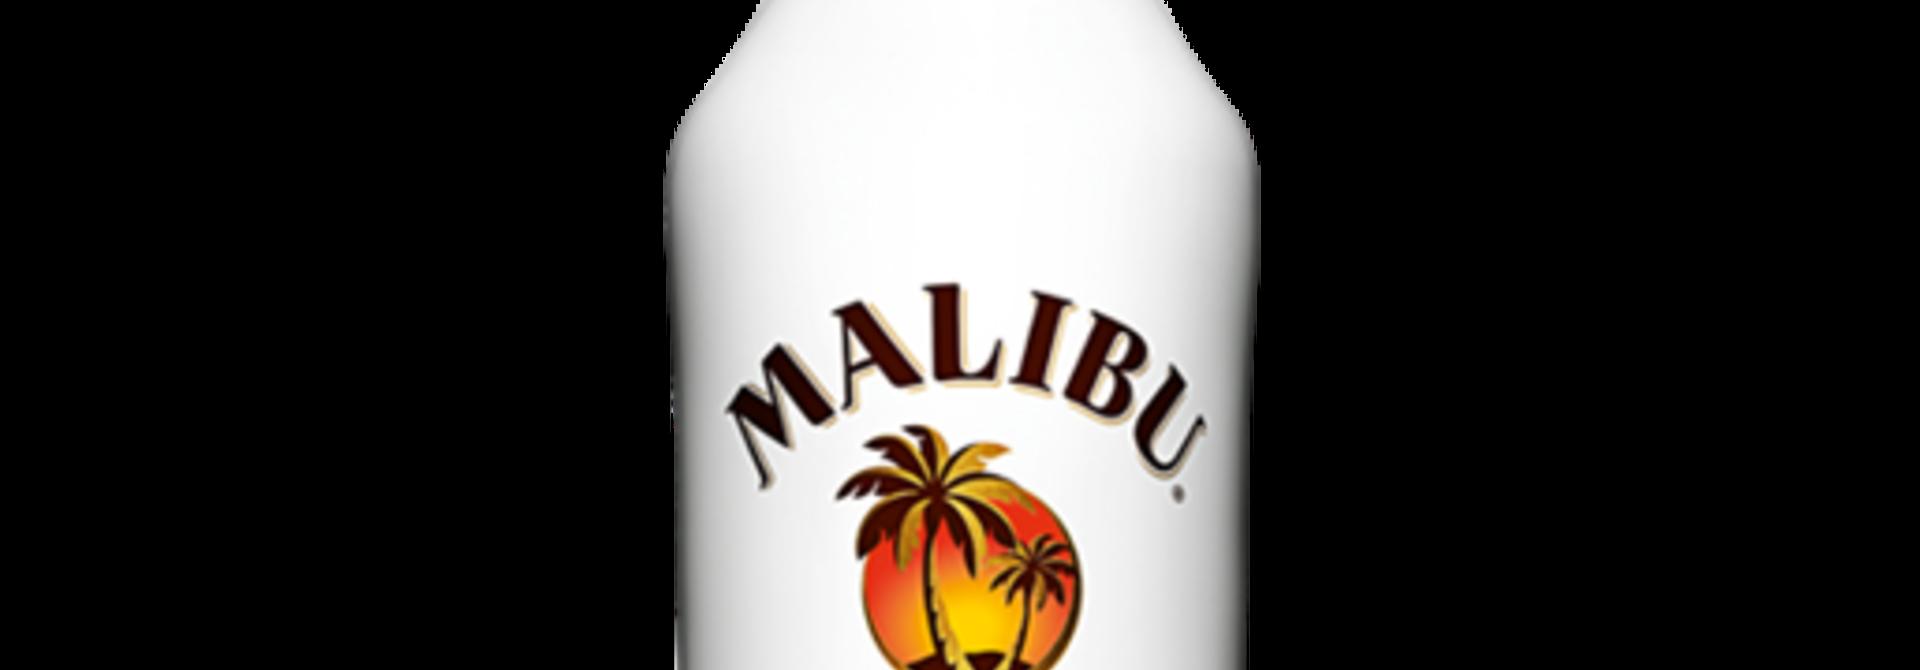 Malibu 1.0ltr